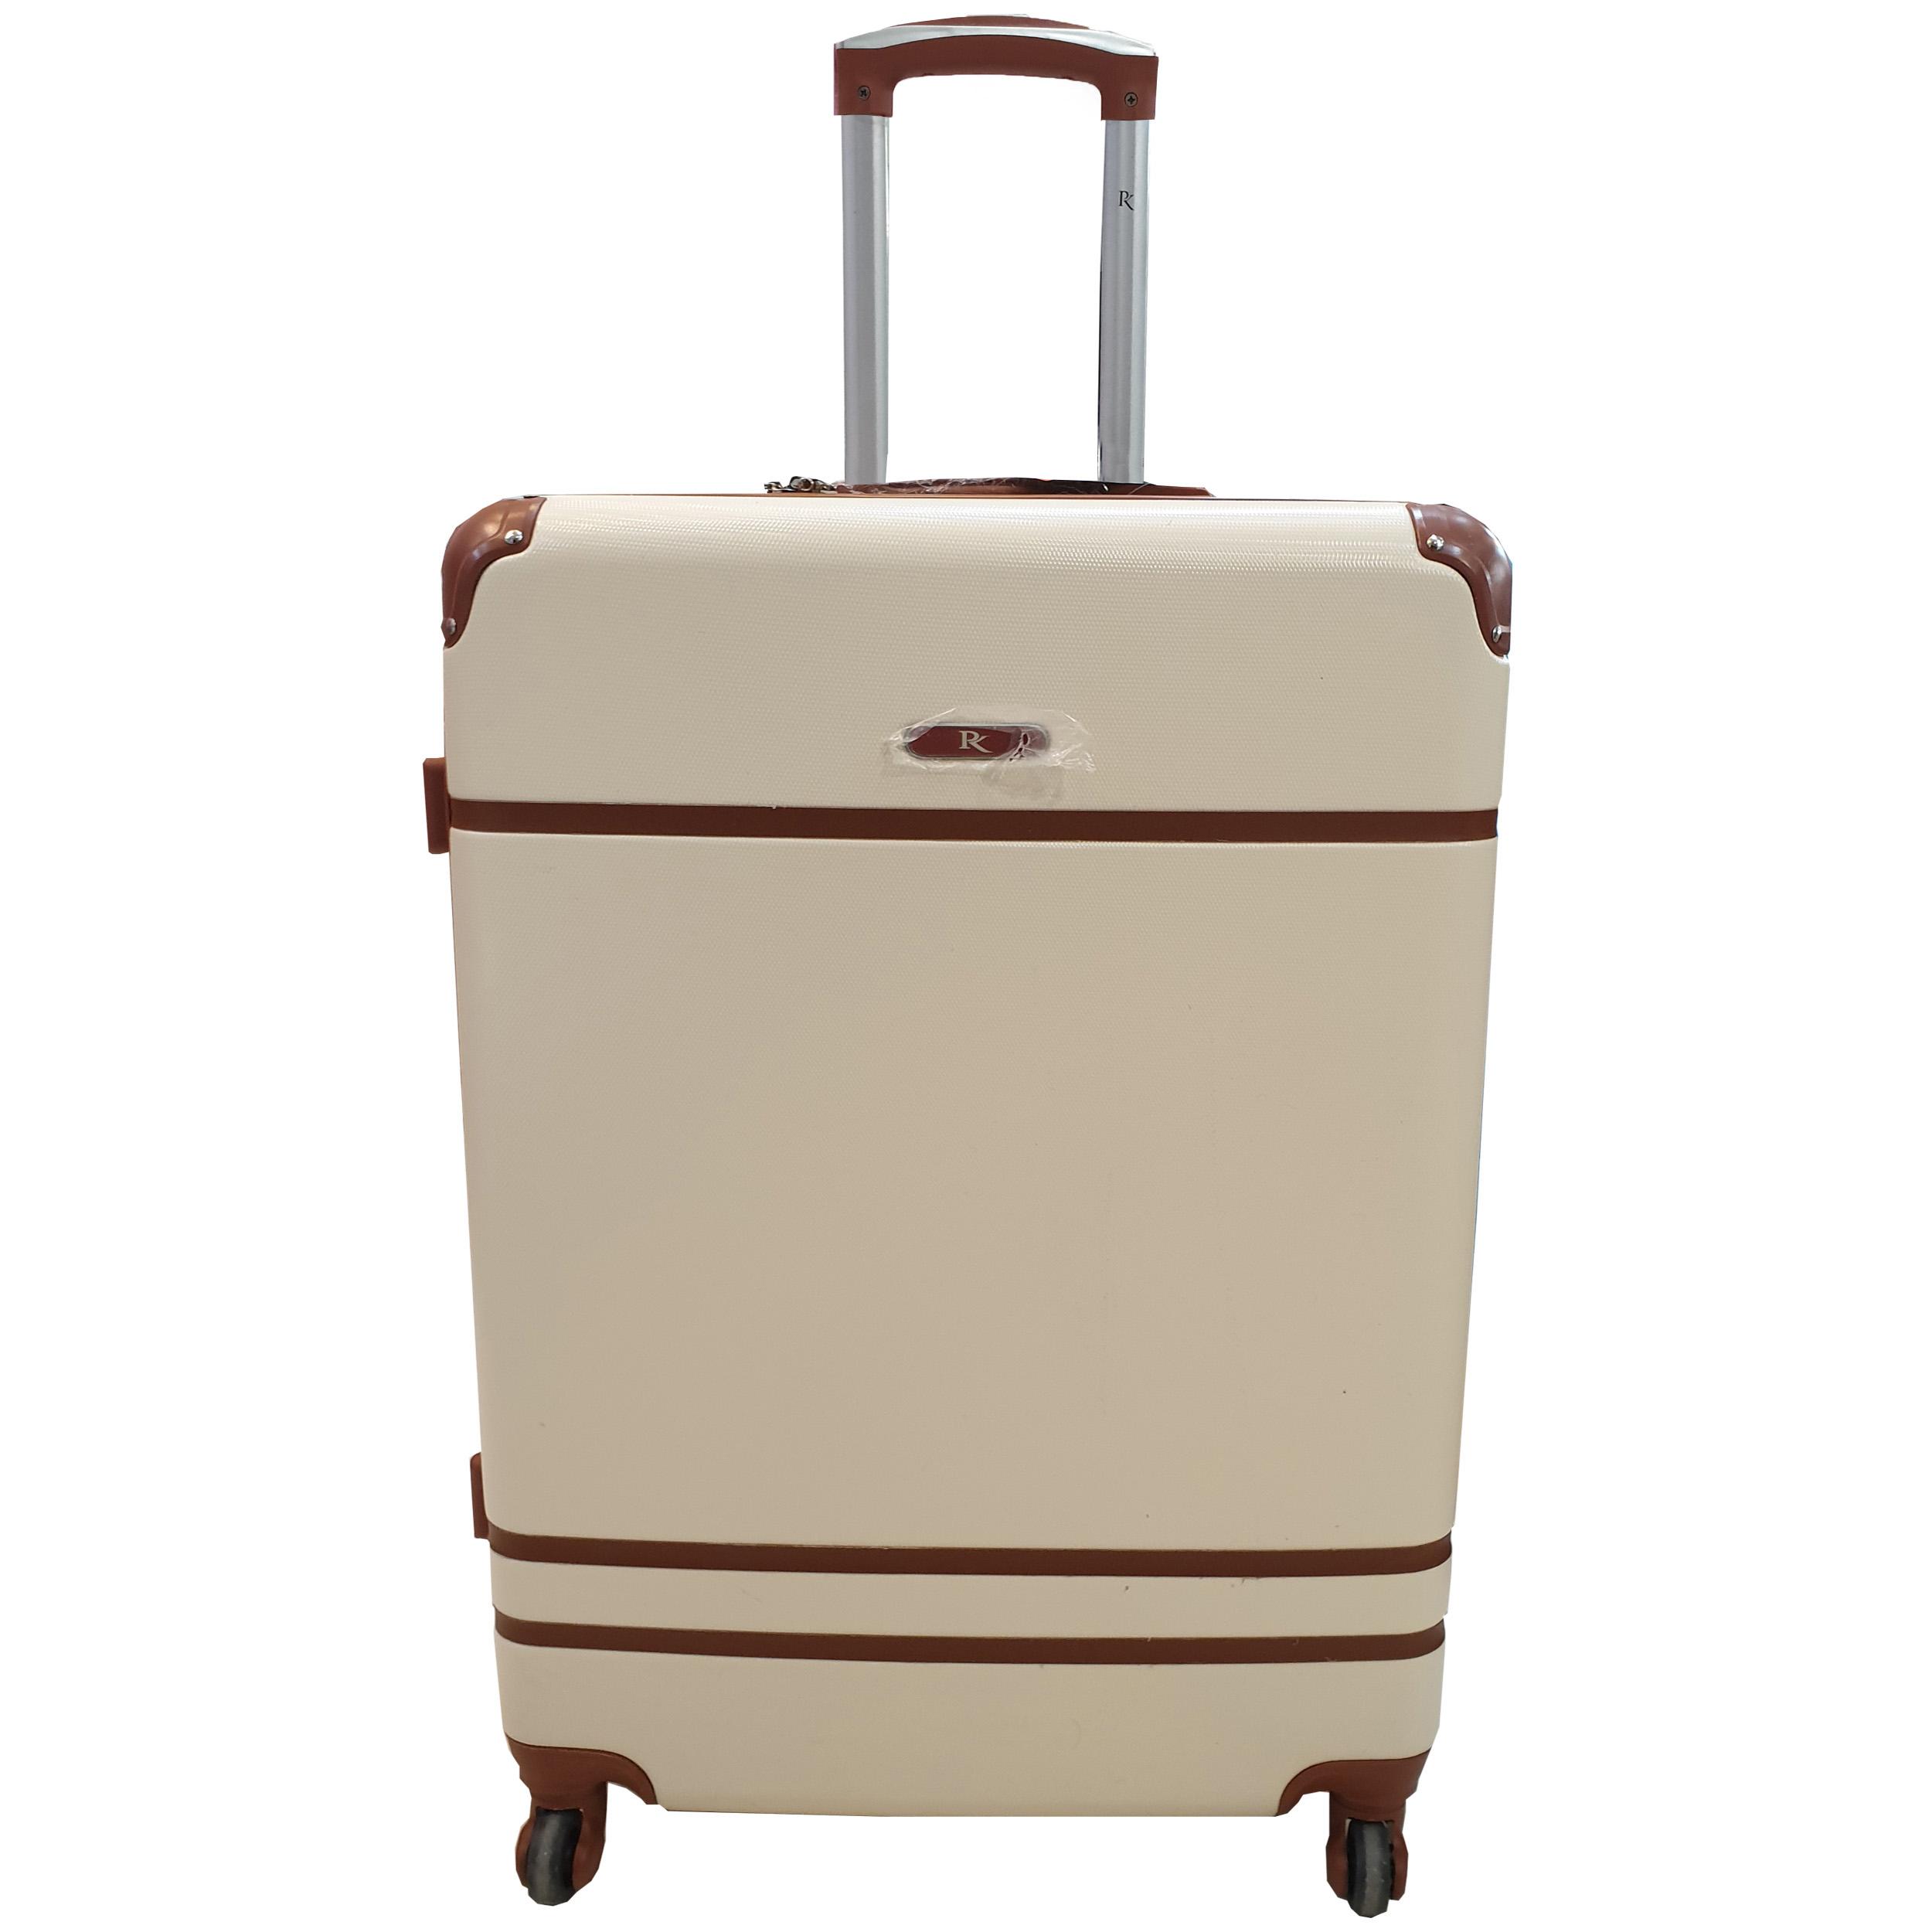 چمدان پی کی کد B002 سایز بزرگ